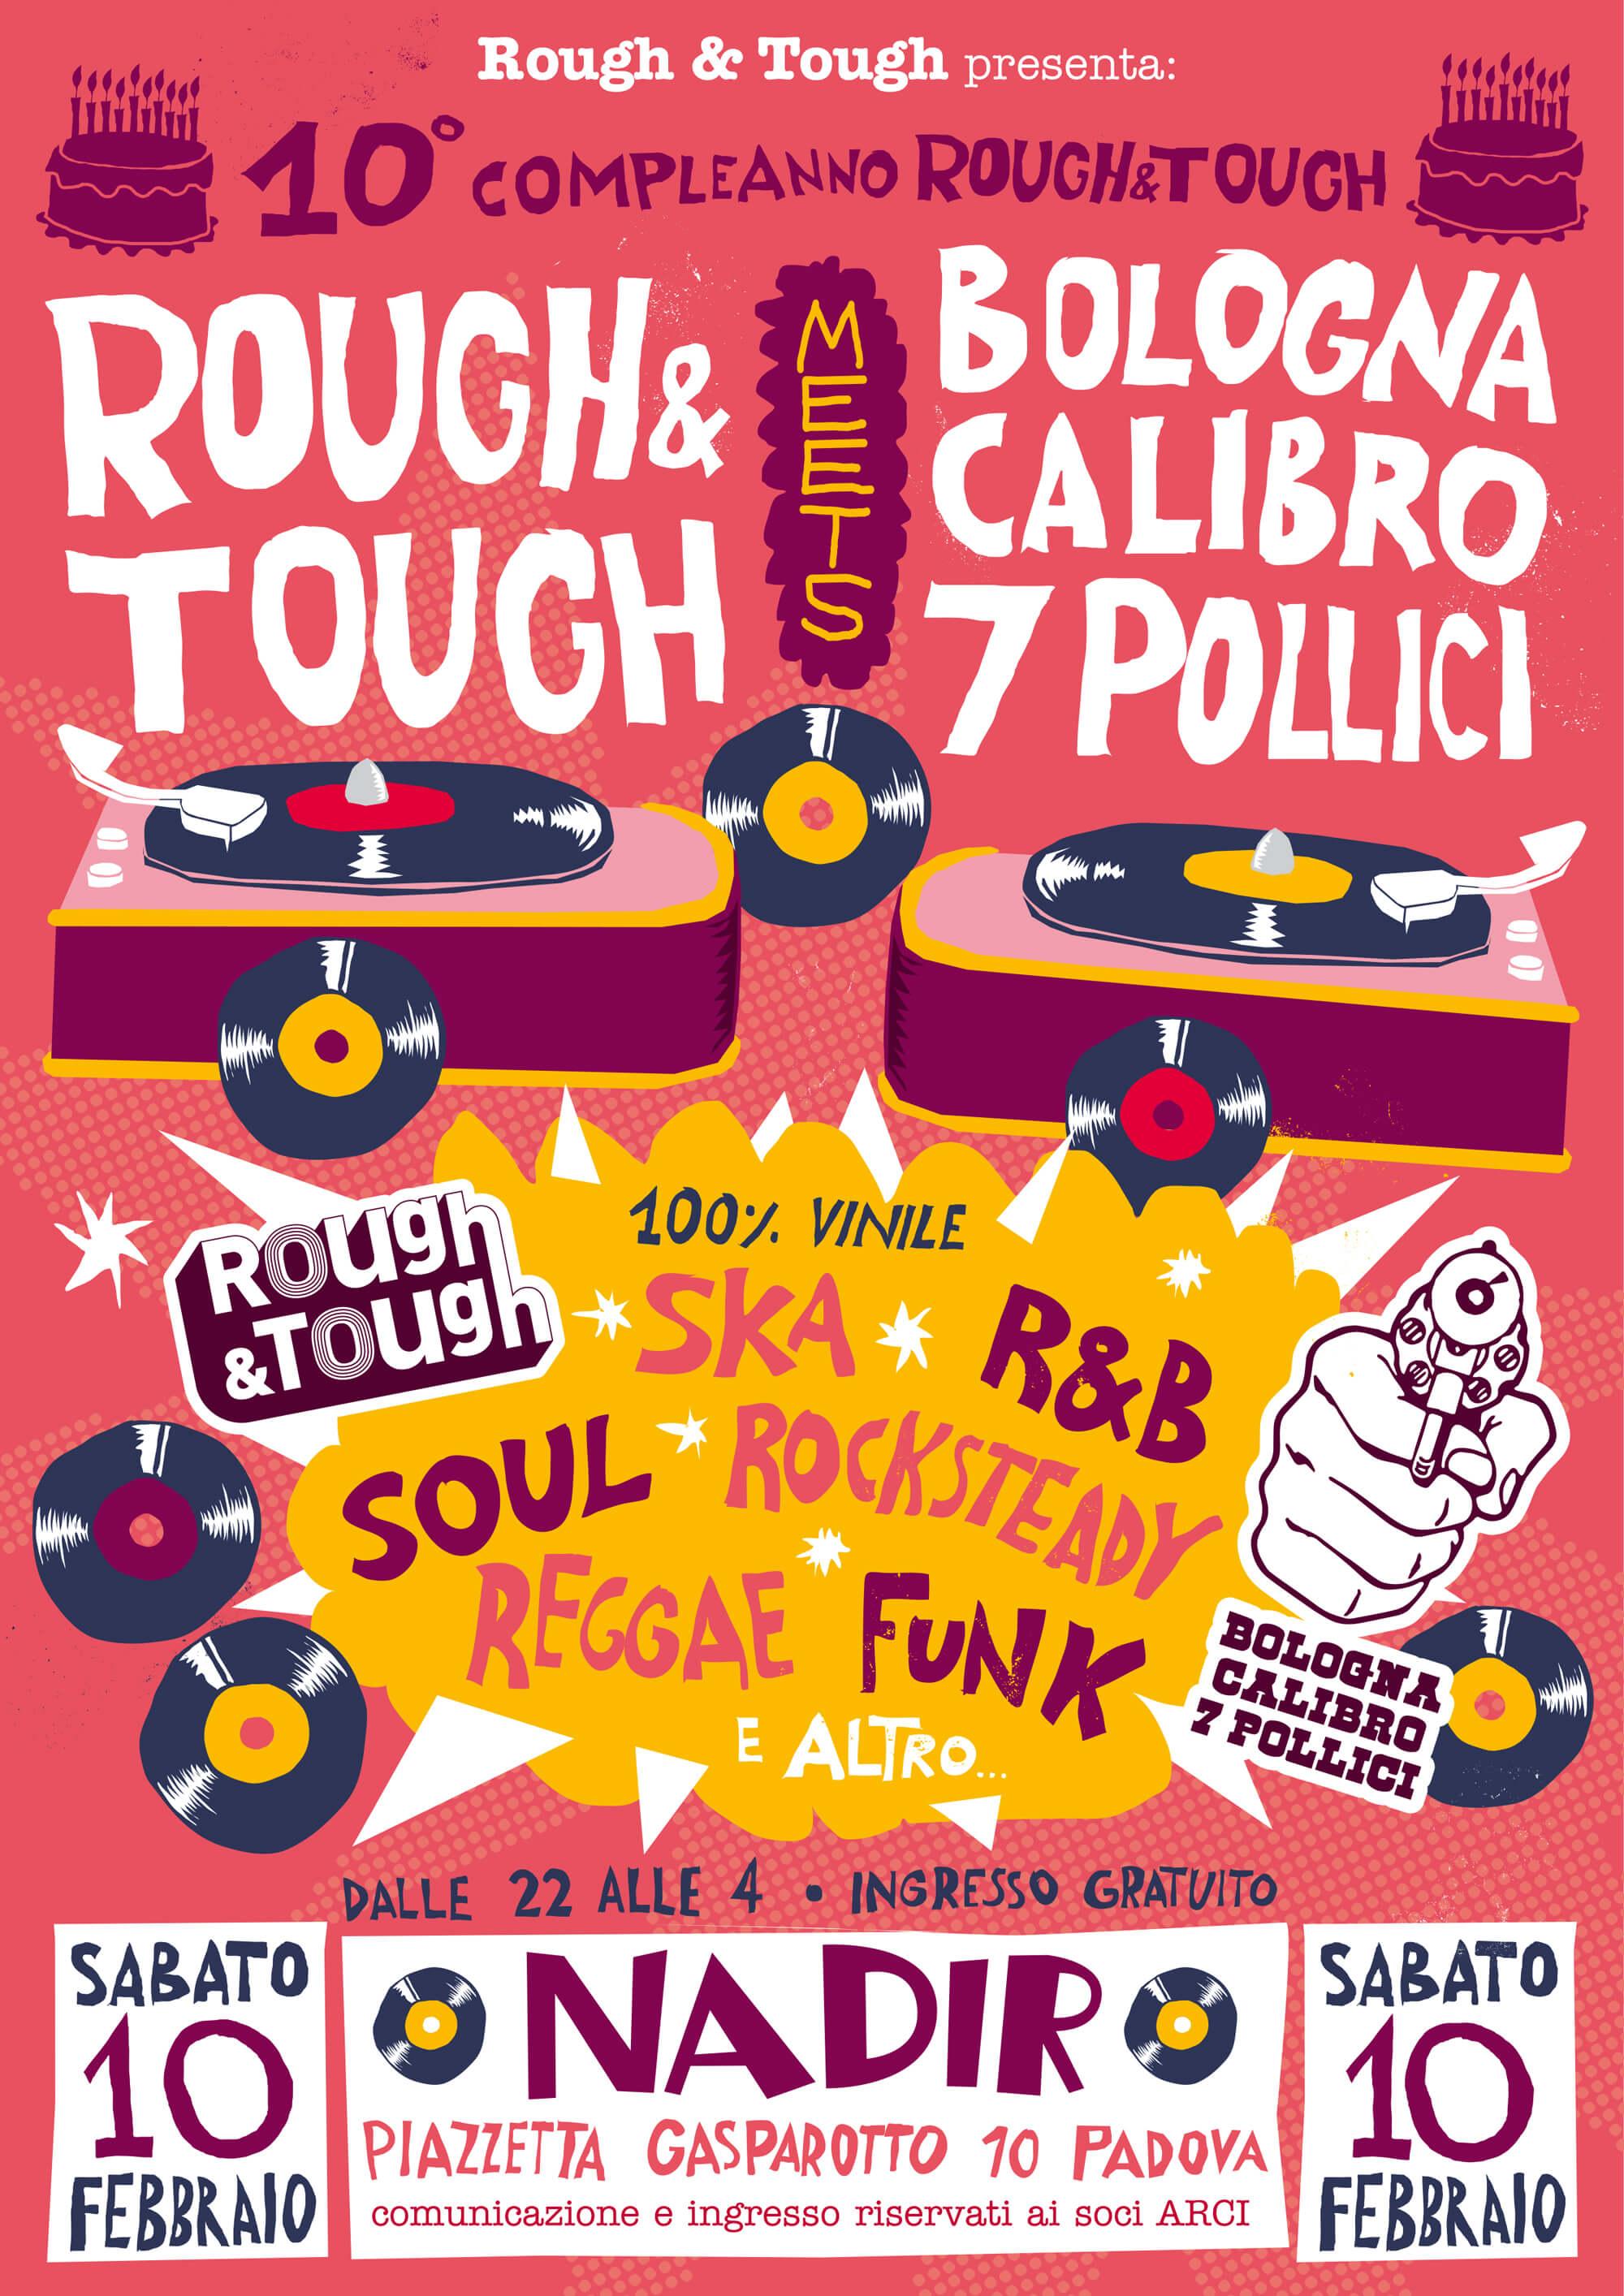 flyer serata musica reggae ska r&b soul funk, sabato 10 febbraio 2018 a Padova